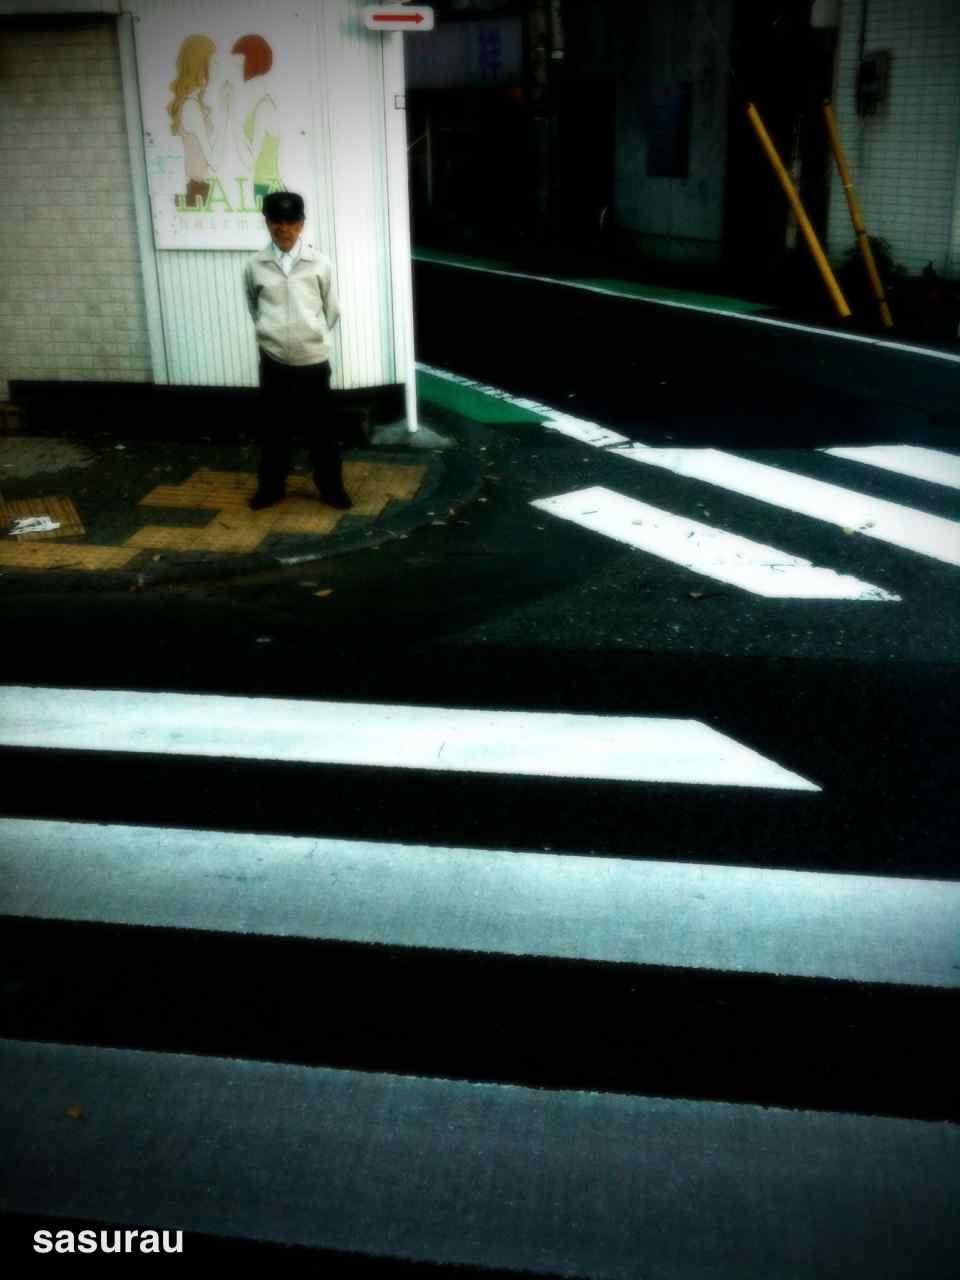 3591793-photo_by_camerakit.jpg